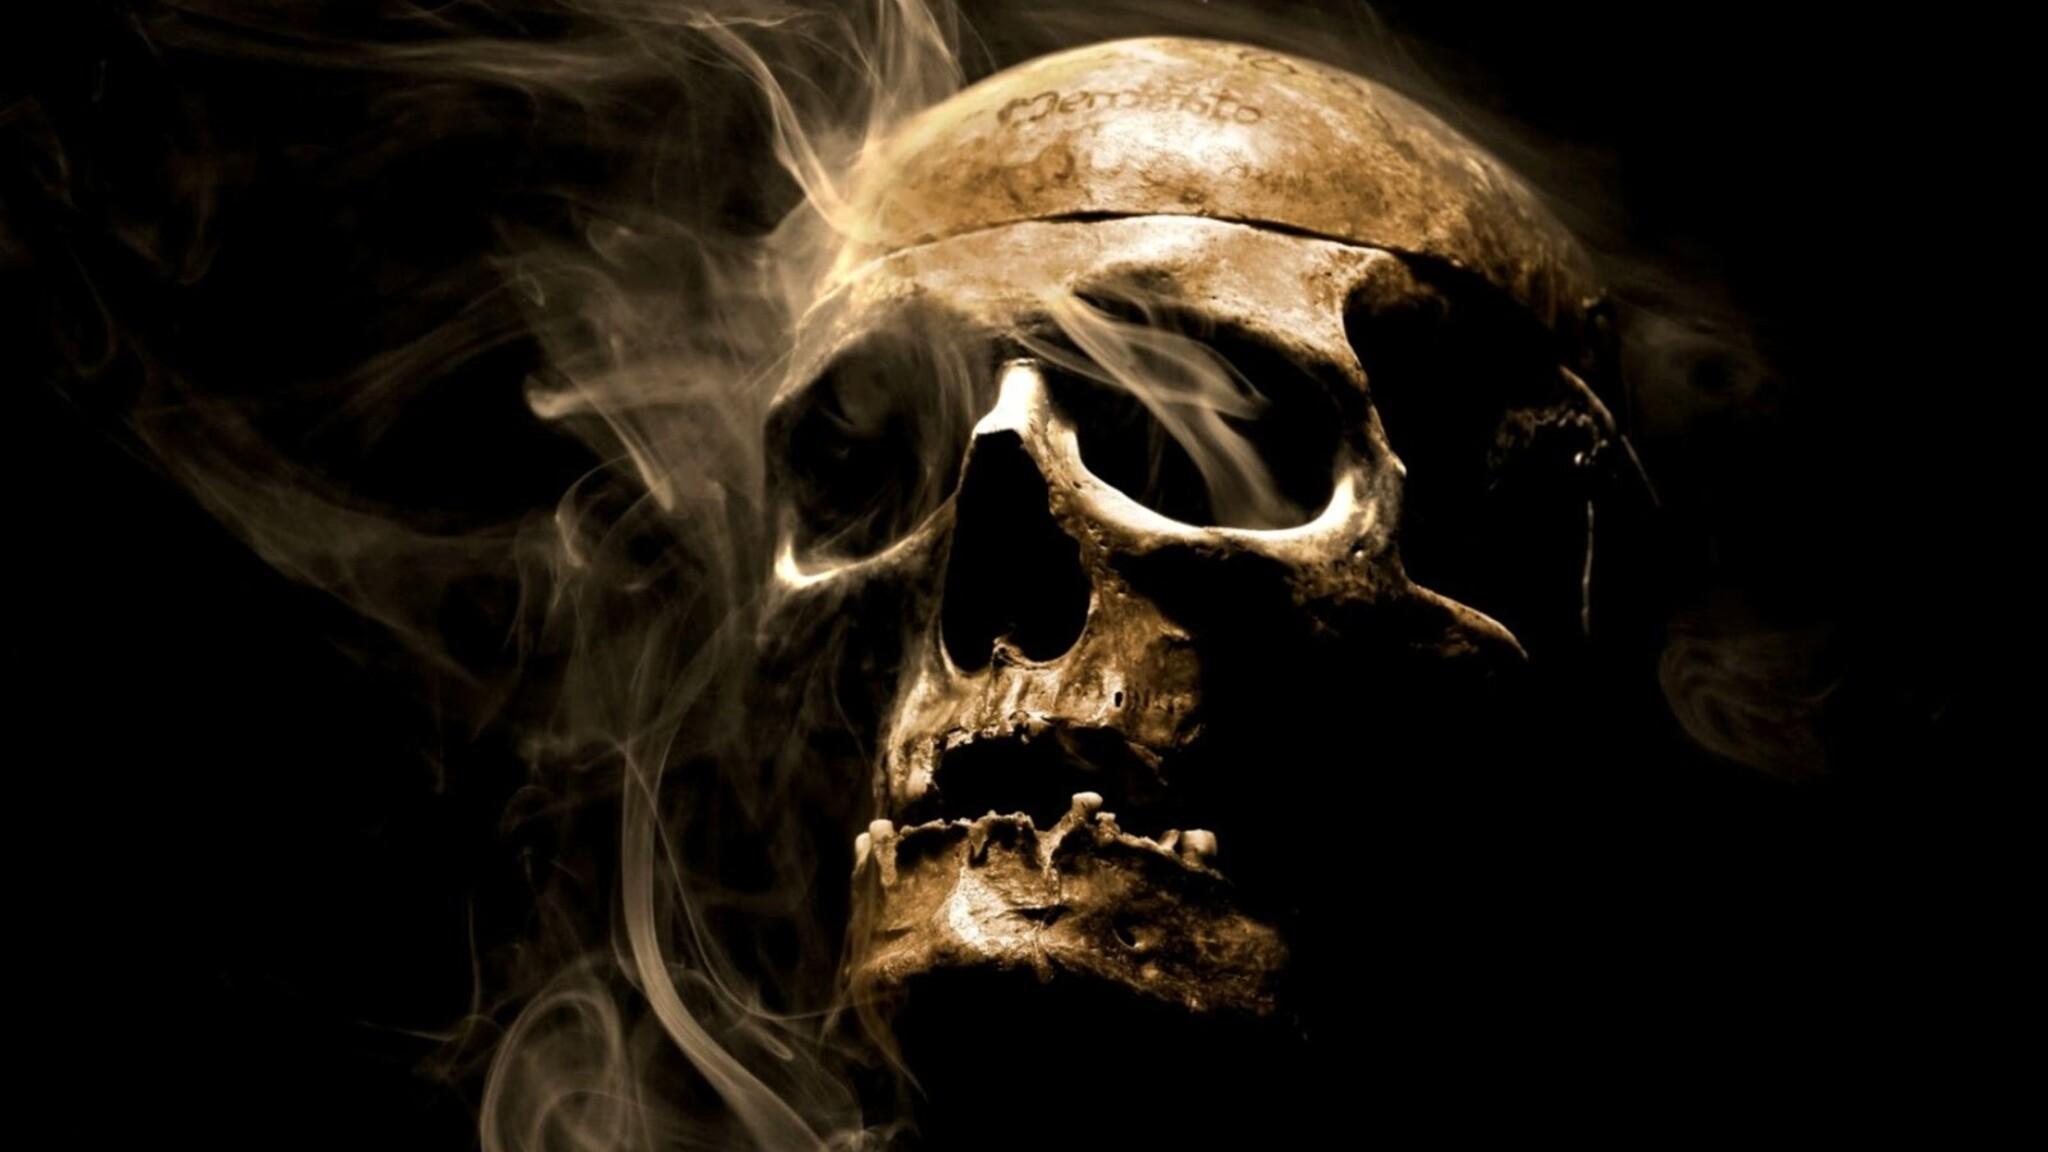 2048x1152 Smoke Skull 2048x1152 Resolution HD 4k ...